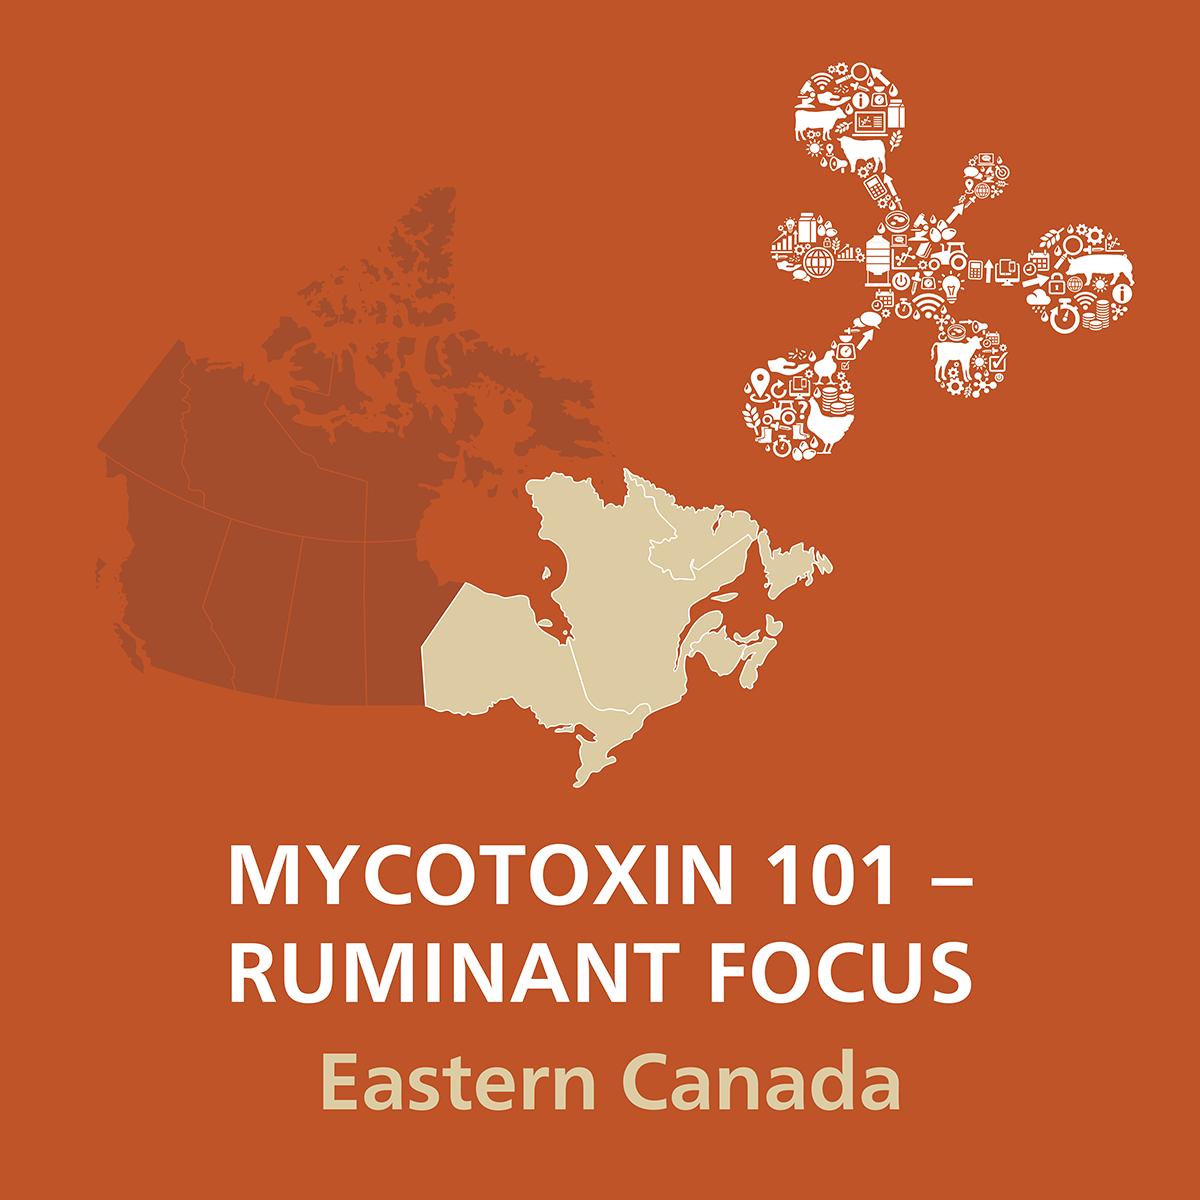 Mycotoxin101_RuminantFocus_EasternCanada